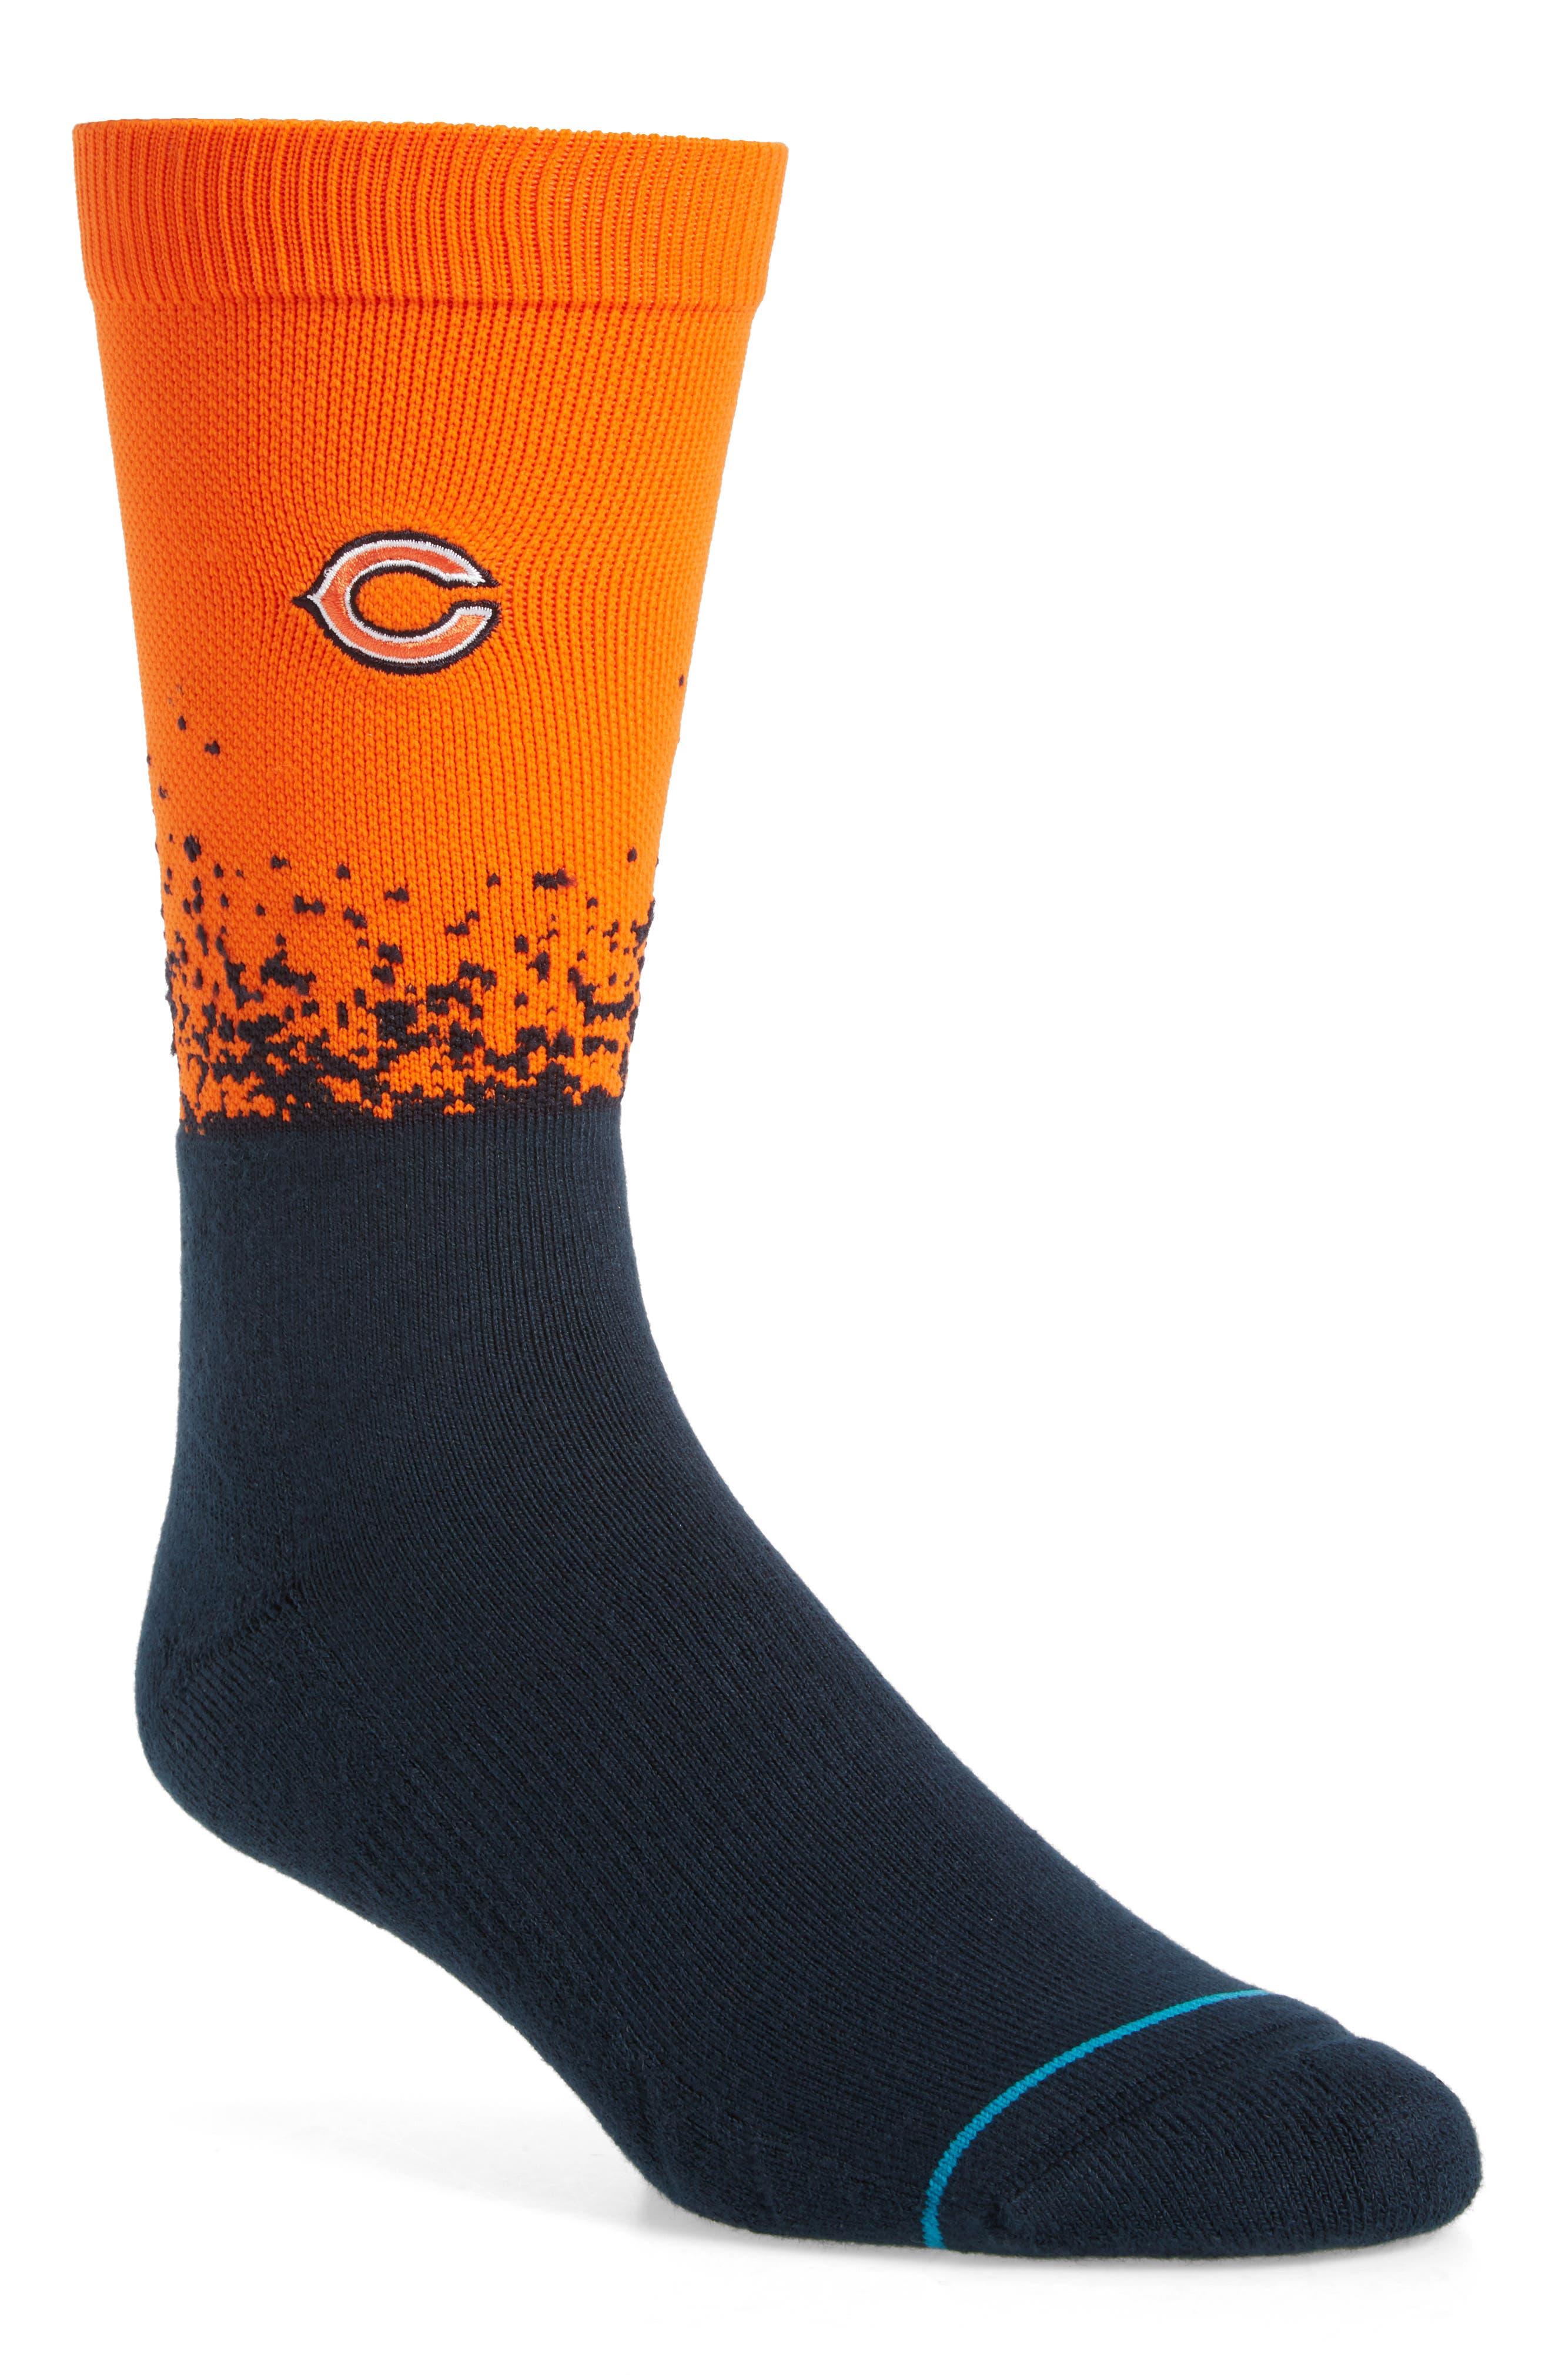 Alternate Image 1 Selected - Stance Chicago Bears - Fade Socks